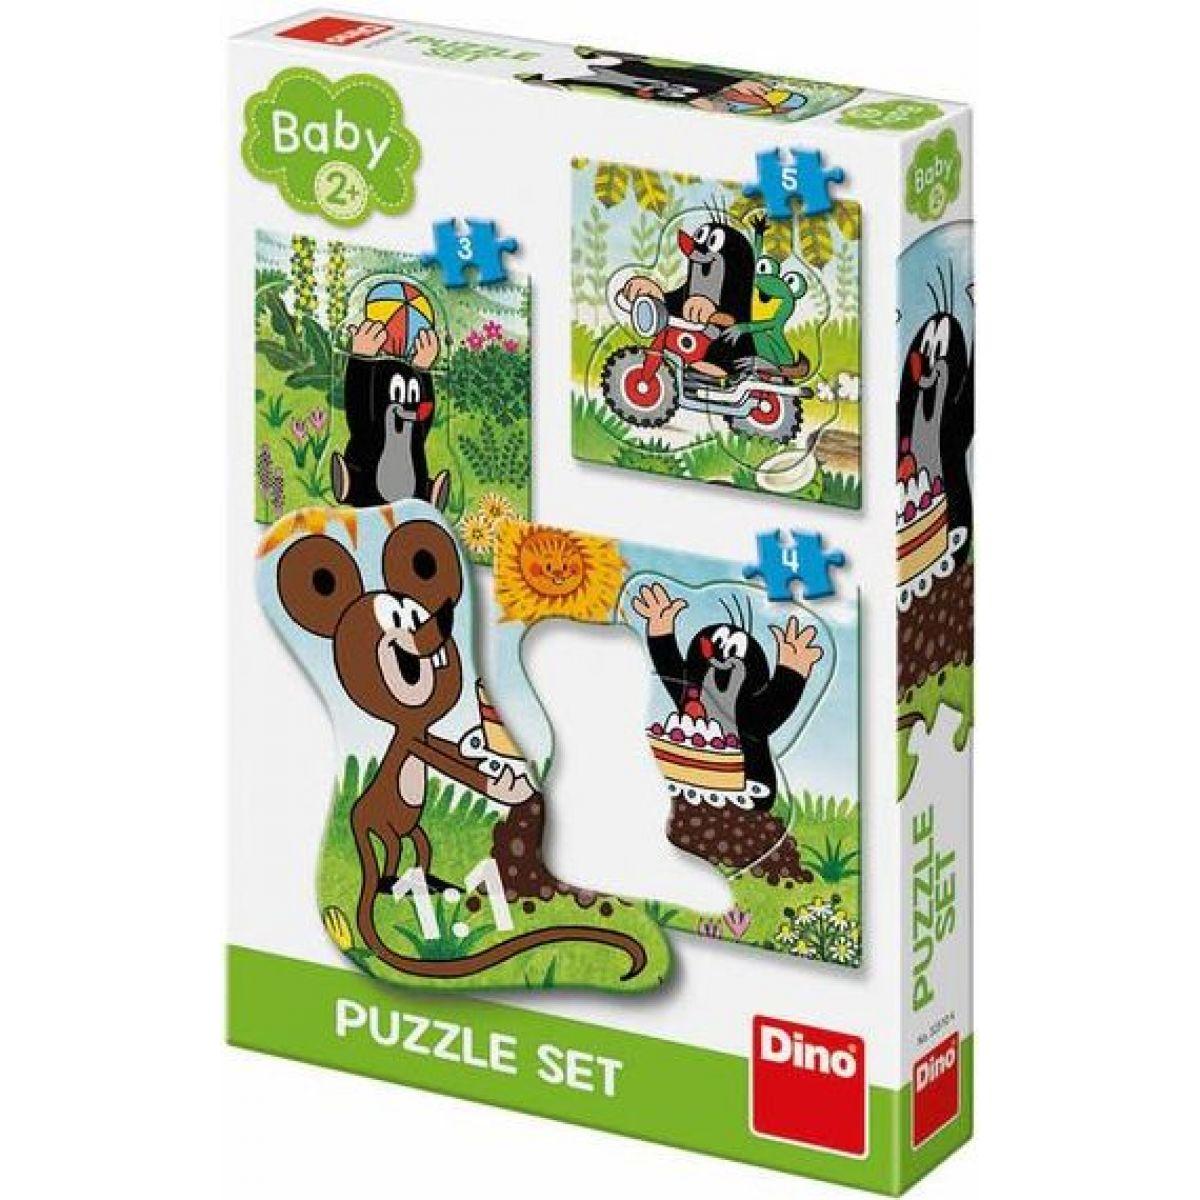 Dino Krtek na louce baby puzzle set